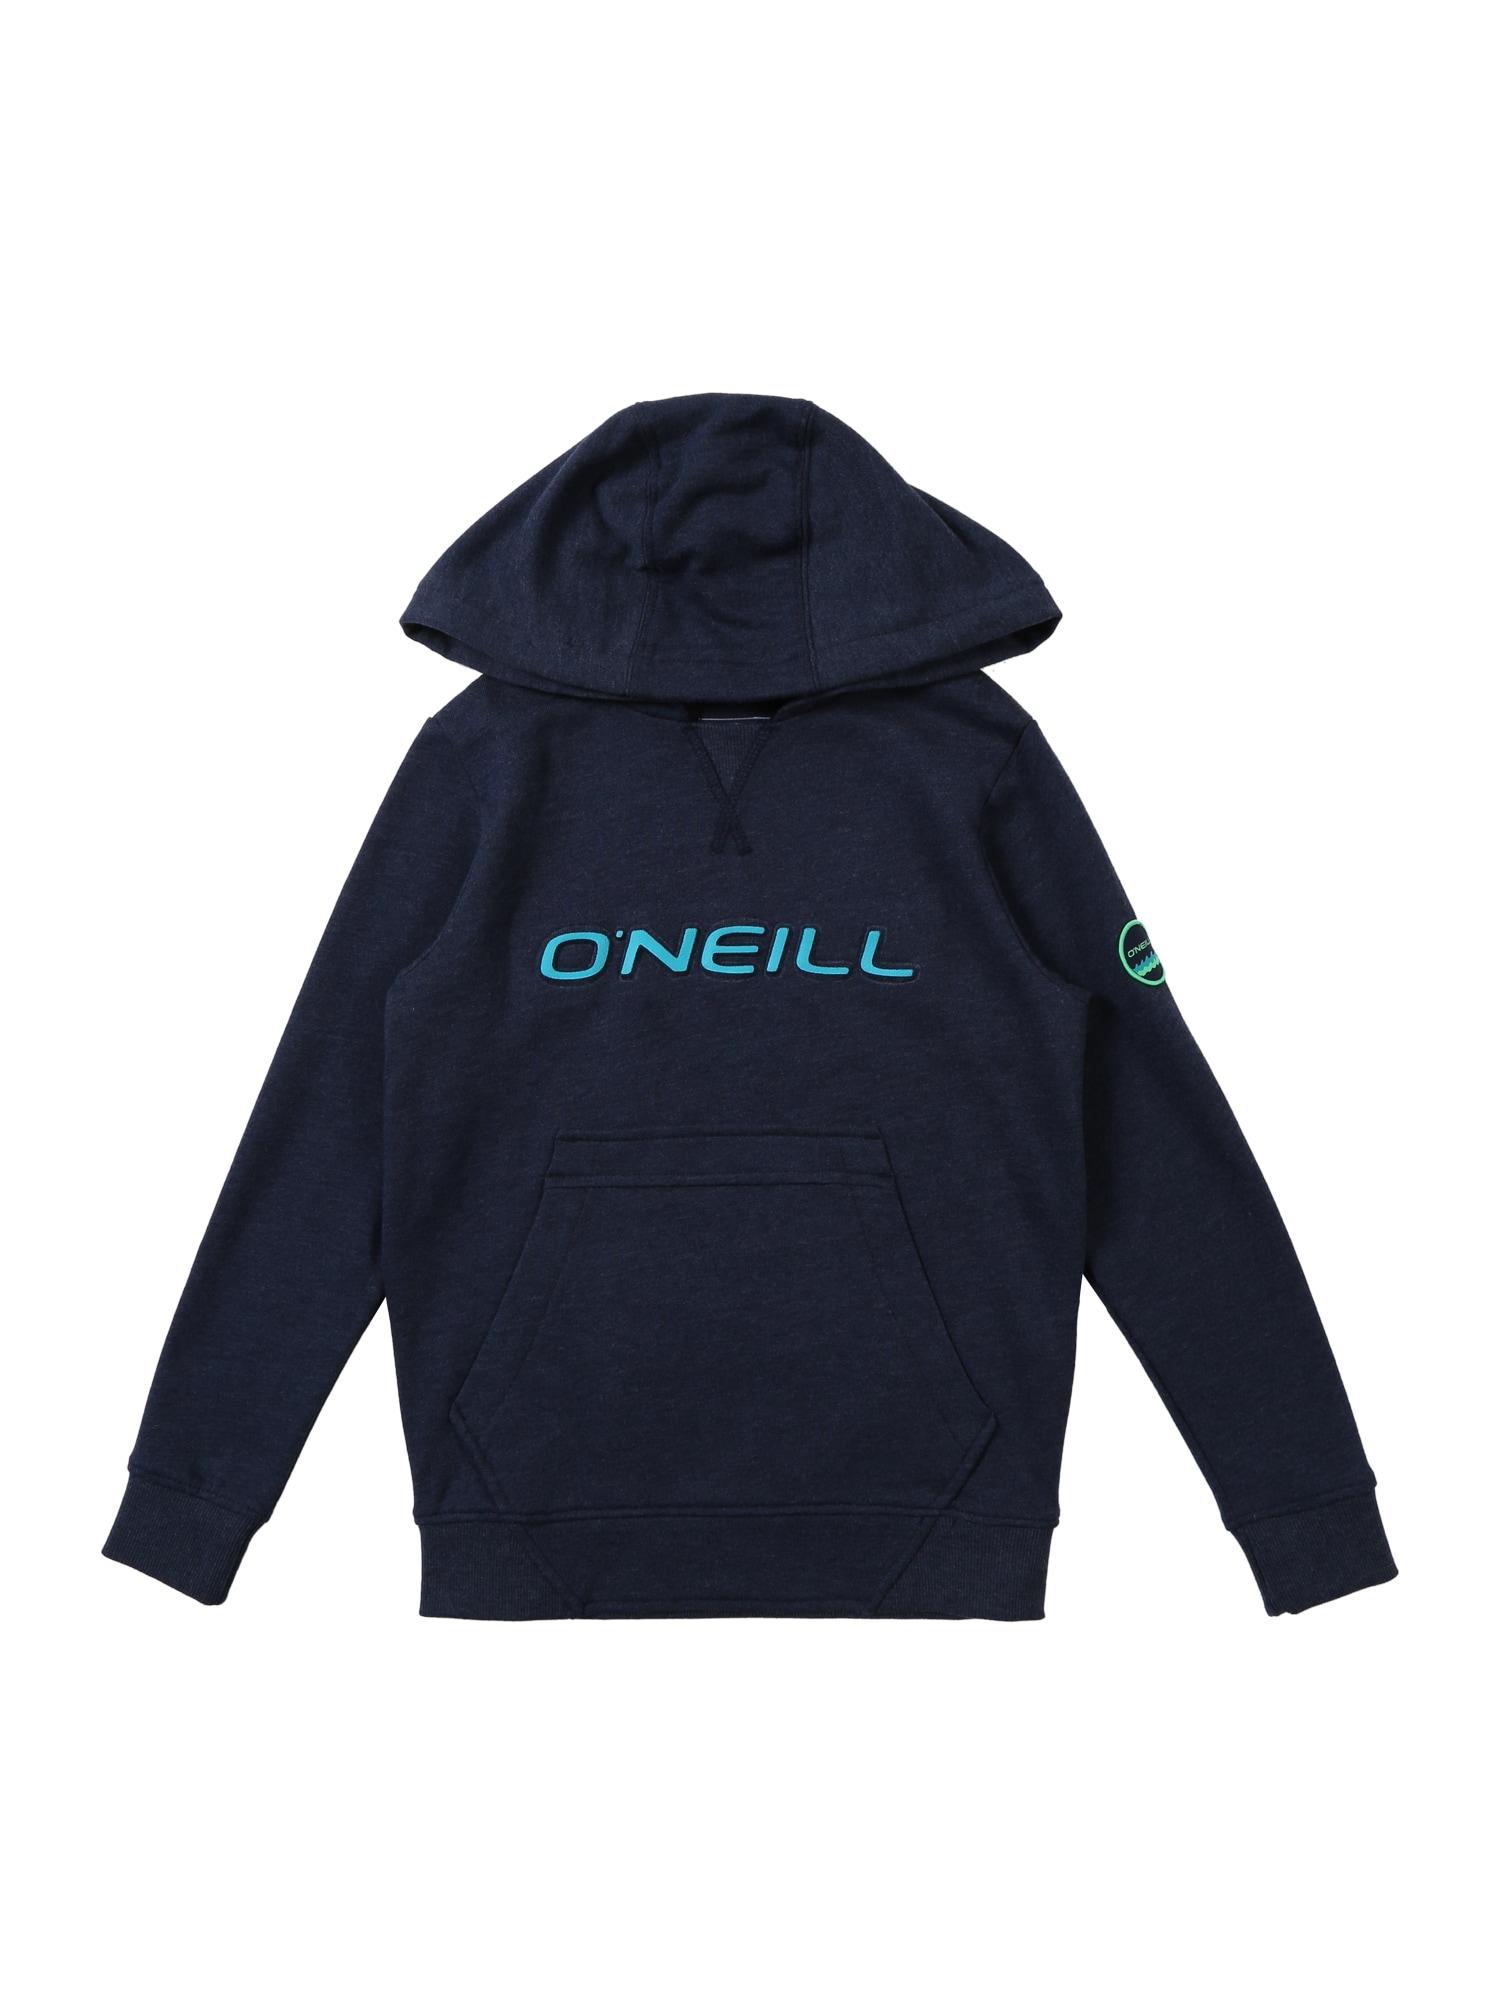 ONEILL Mikina LB PACIFIC COAST HOODIE modrá O'NEILL